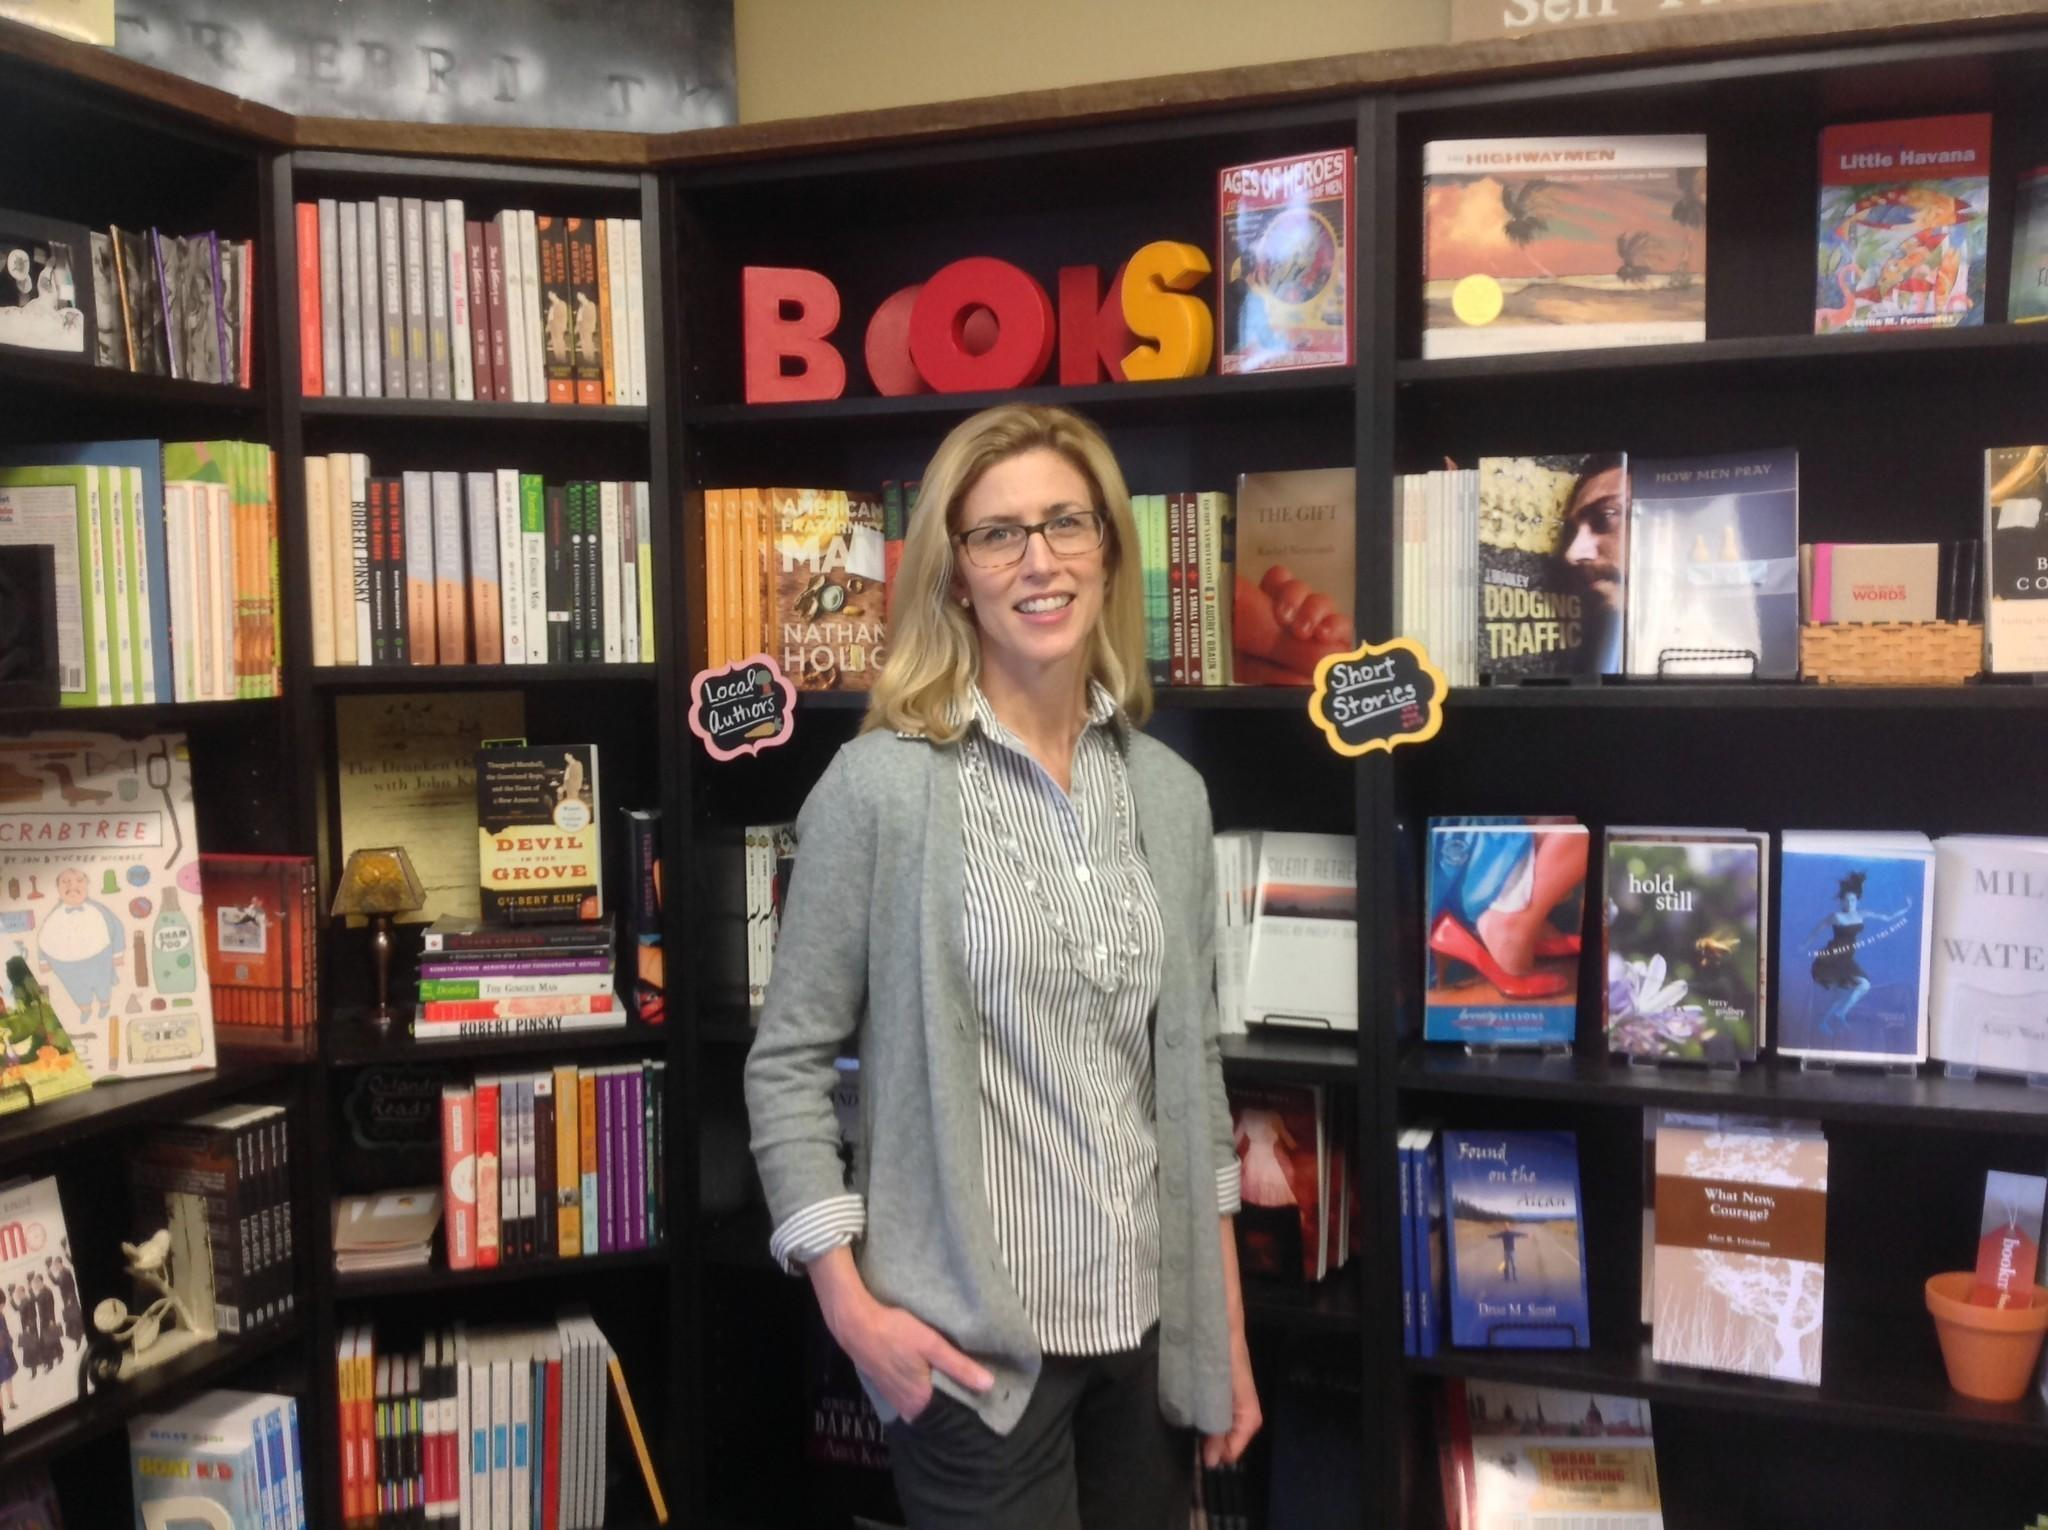 Bookmark It owner Kim Britt banks on Orlando's literary scene.